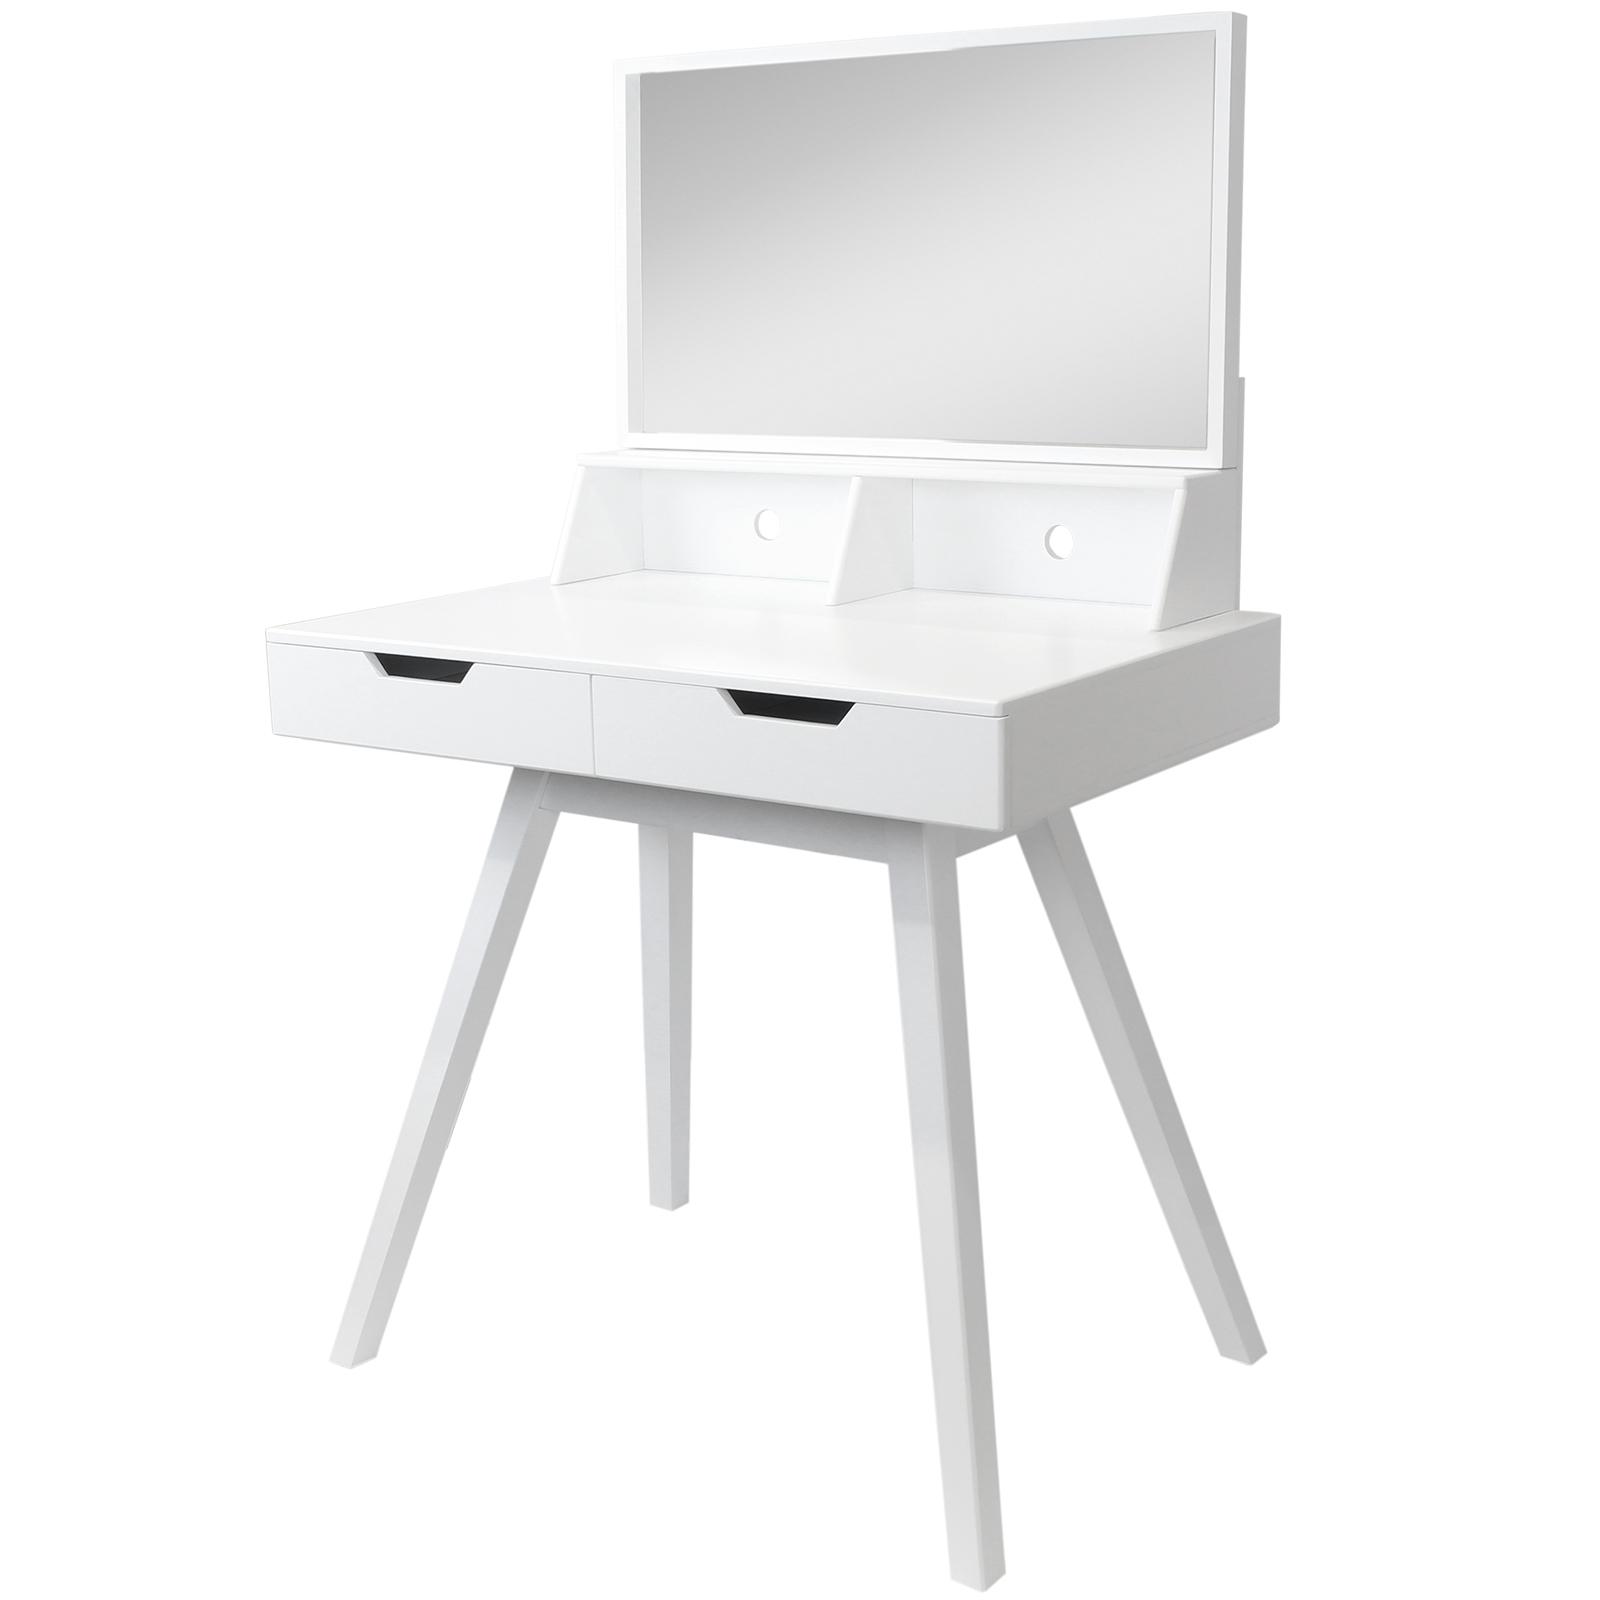 professional makeup chair uk shampoo bowl hartleys white dressing table jewellery storage